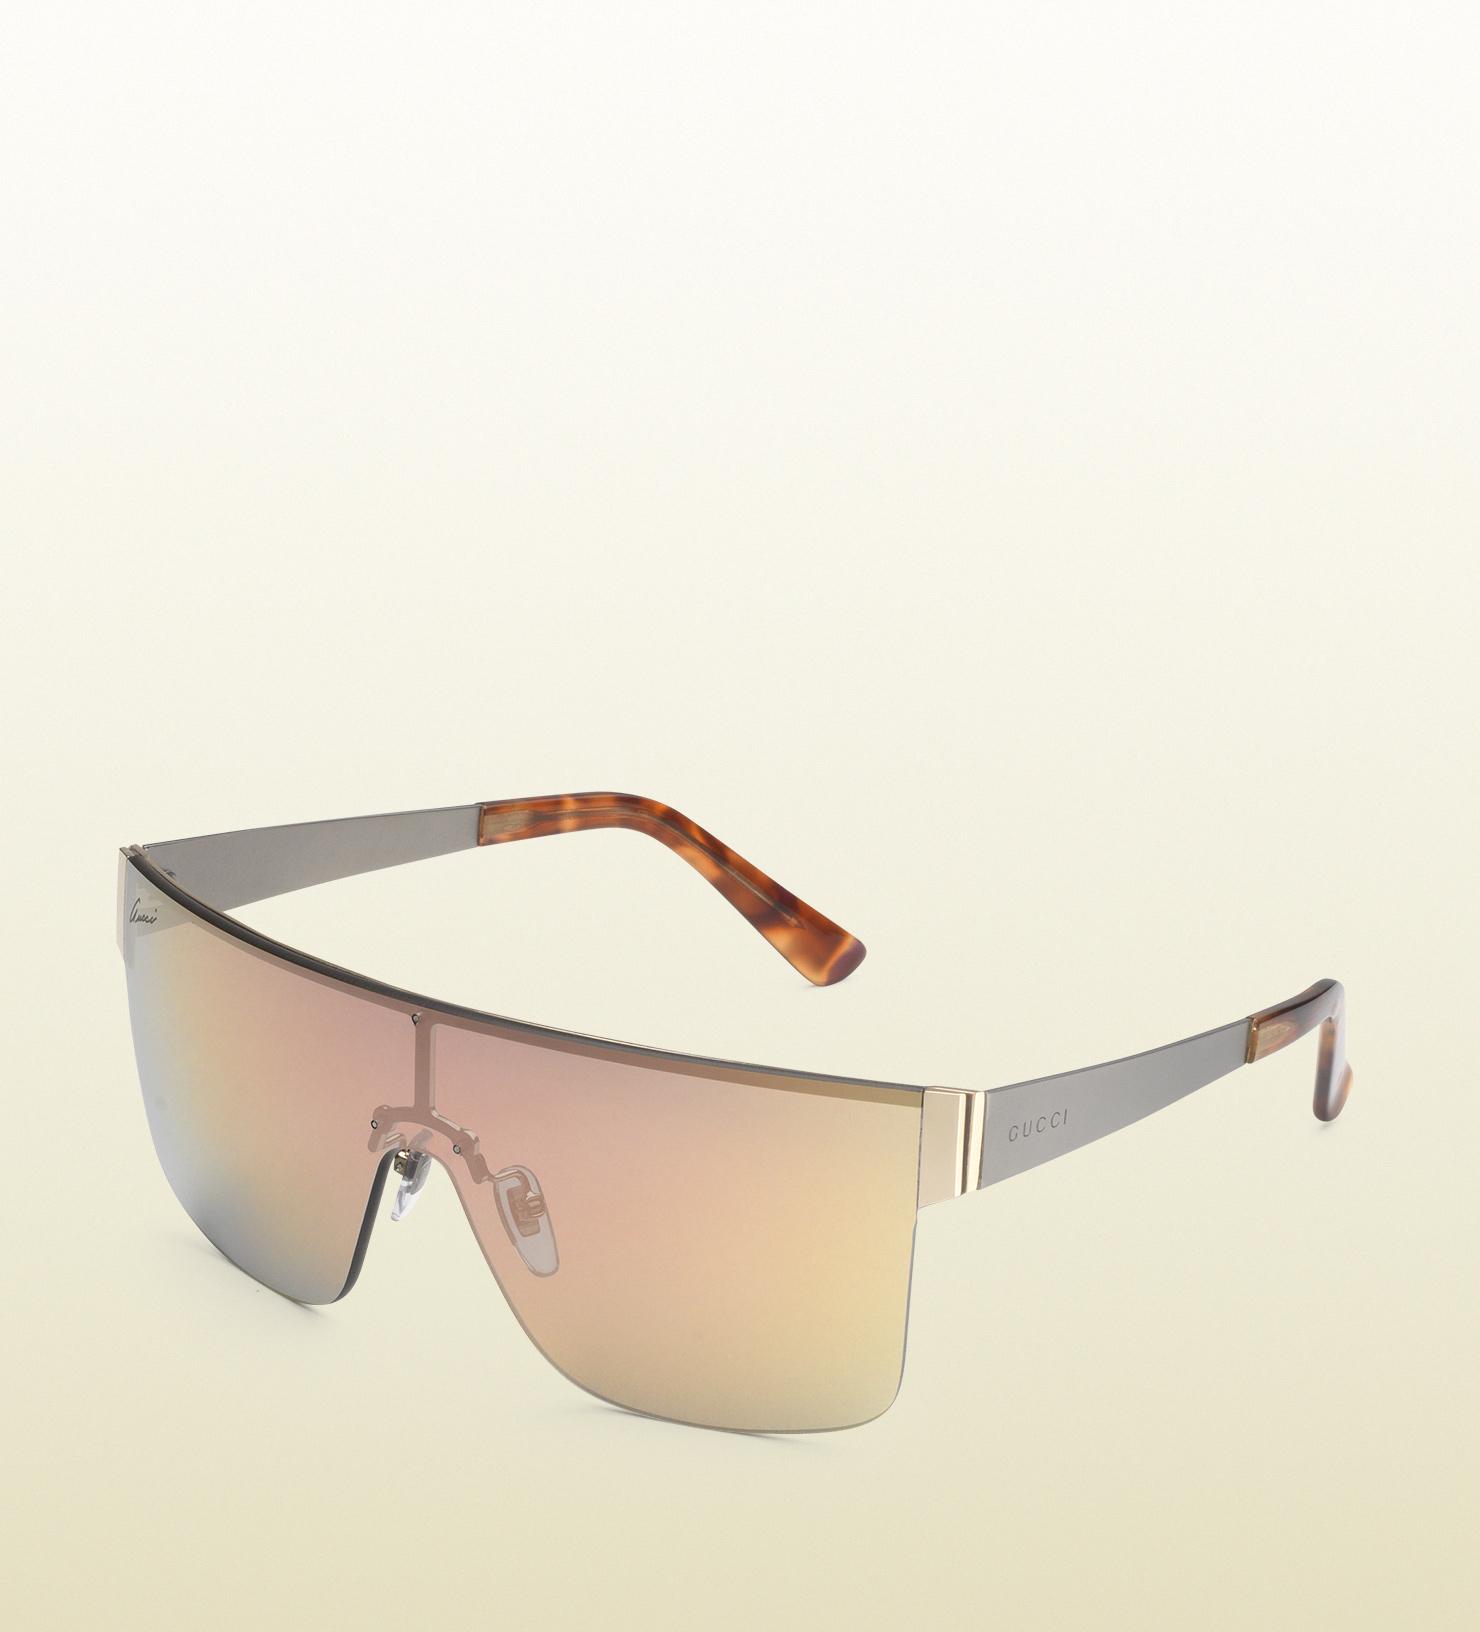 Gucci Metal Frame Glasses : Gucci Mask-frame Metal Sunglasses in Metallic Lyst